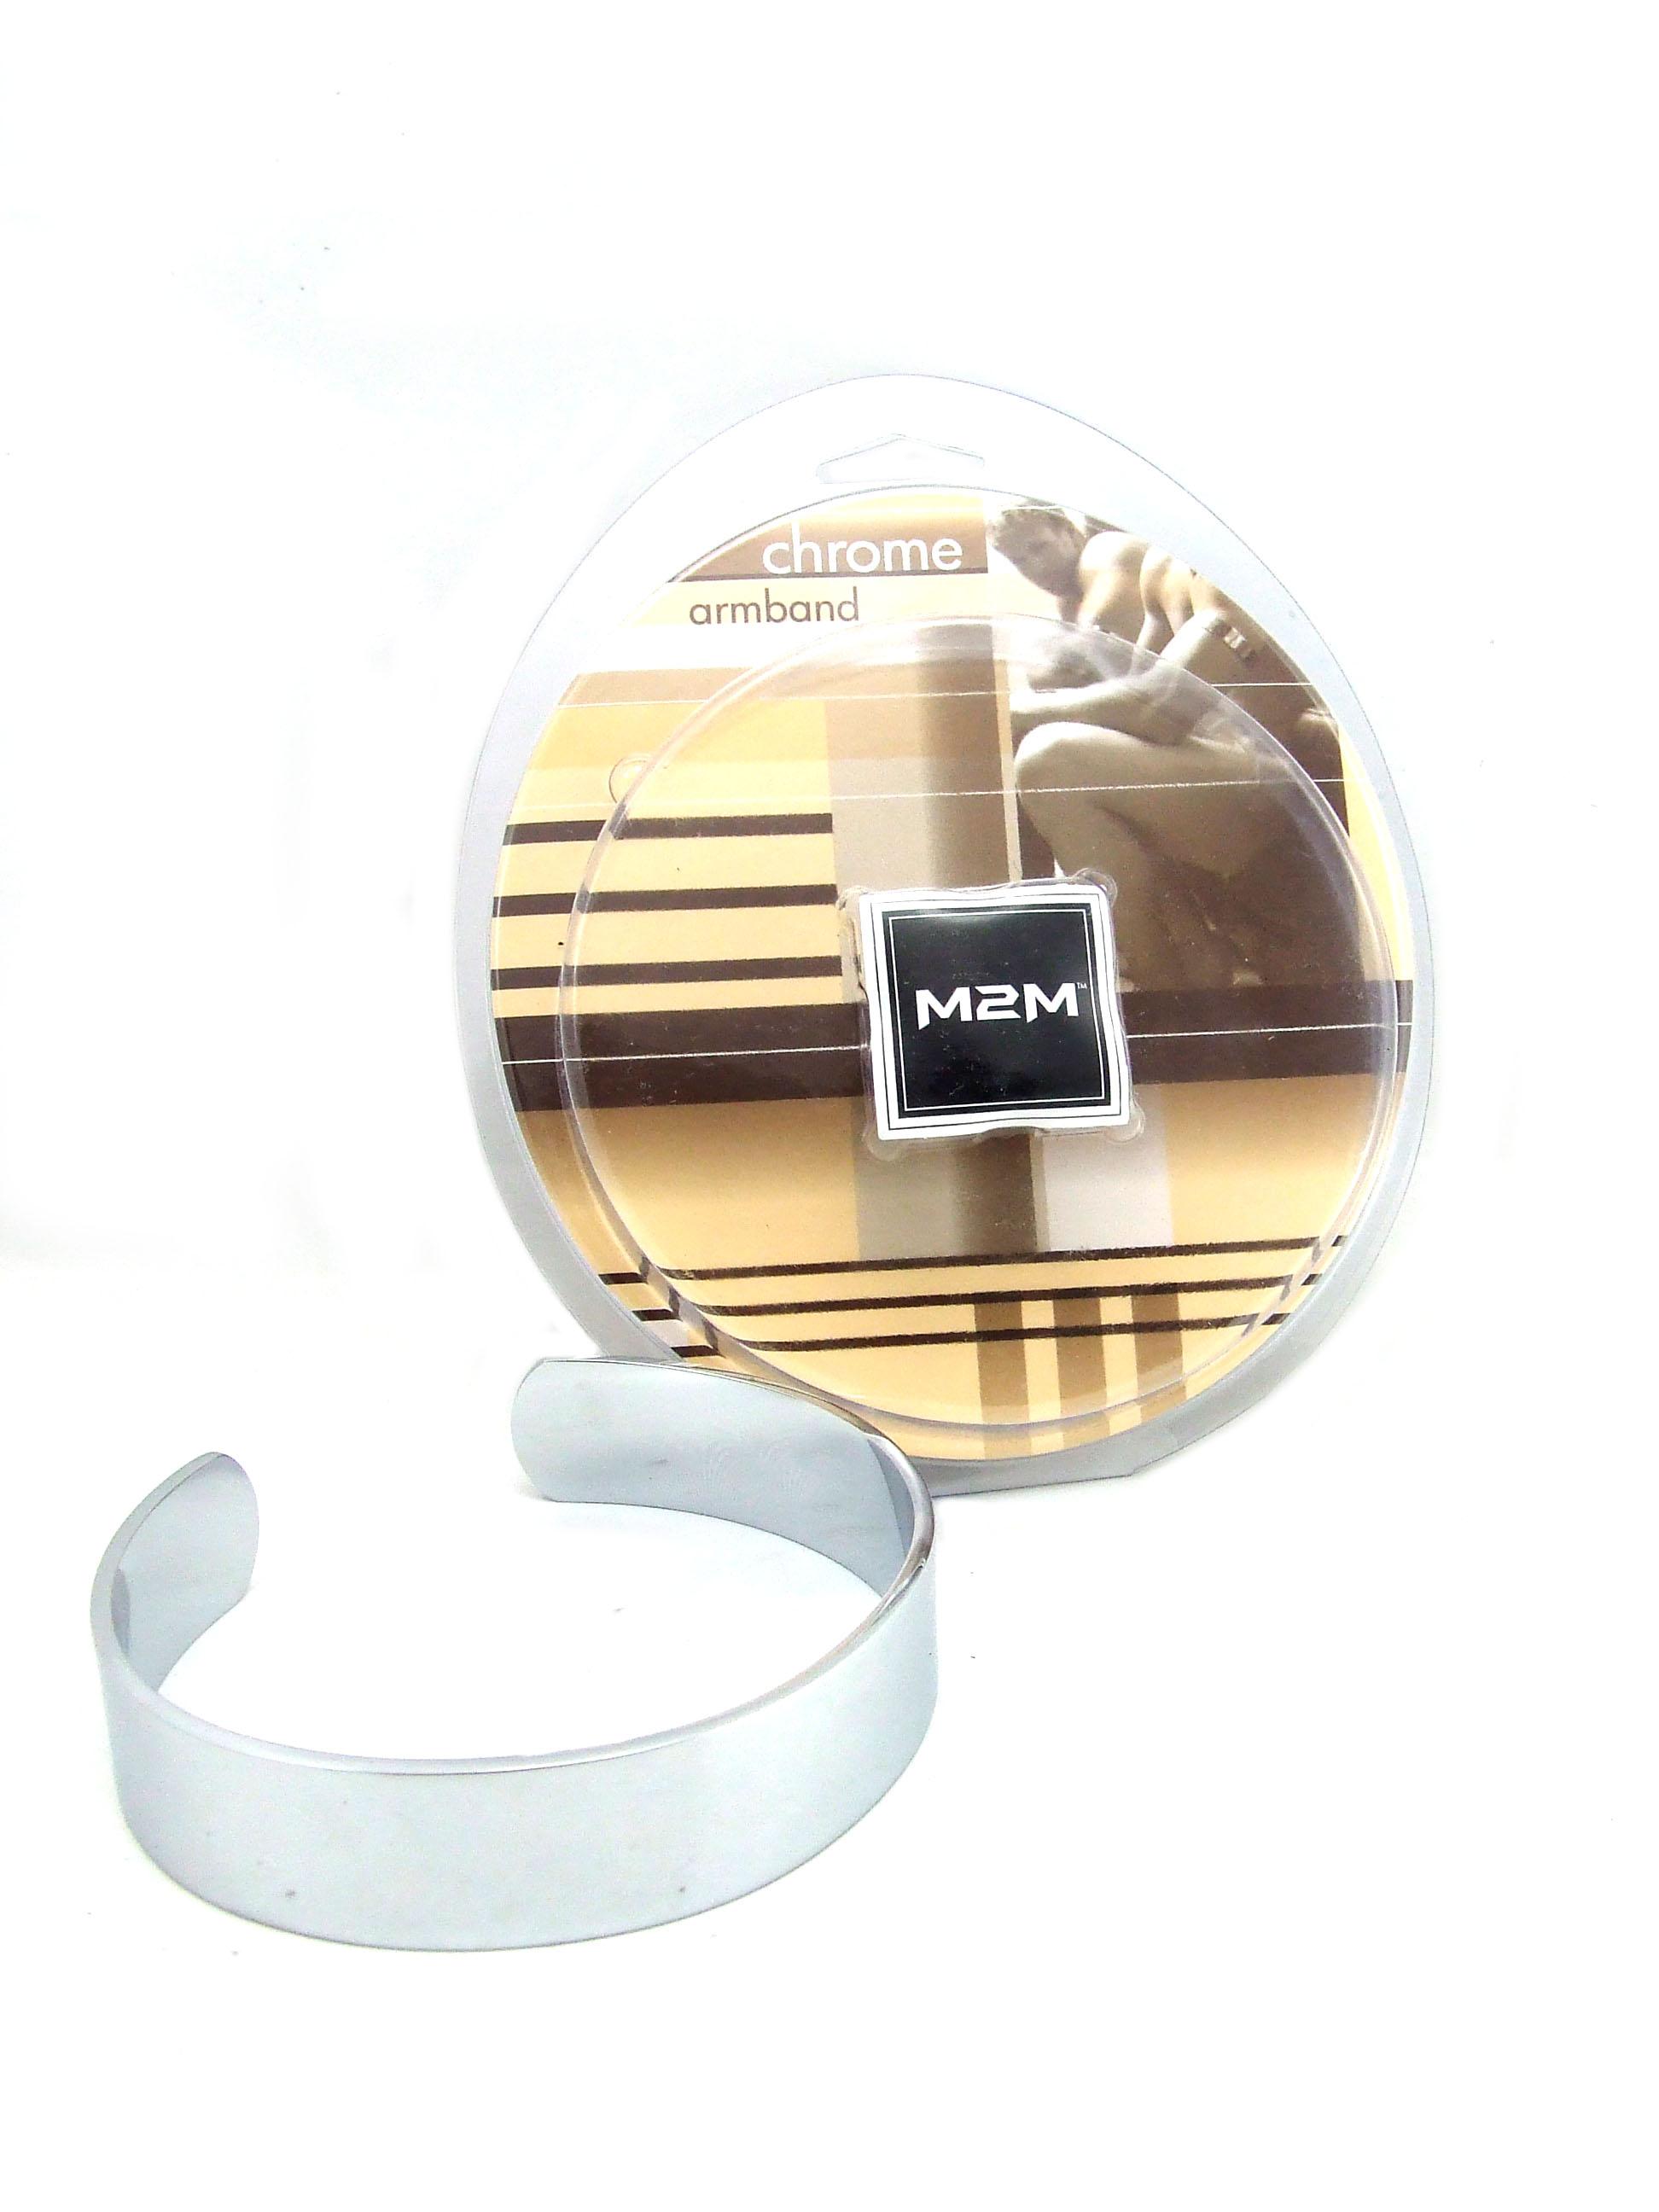 ARMBAND STEEL MEDIUM CHROME - PHSM2M811M